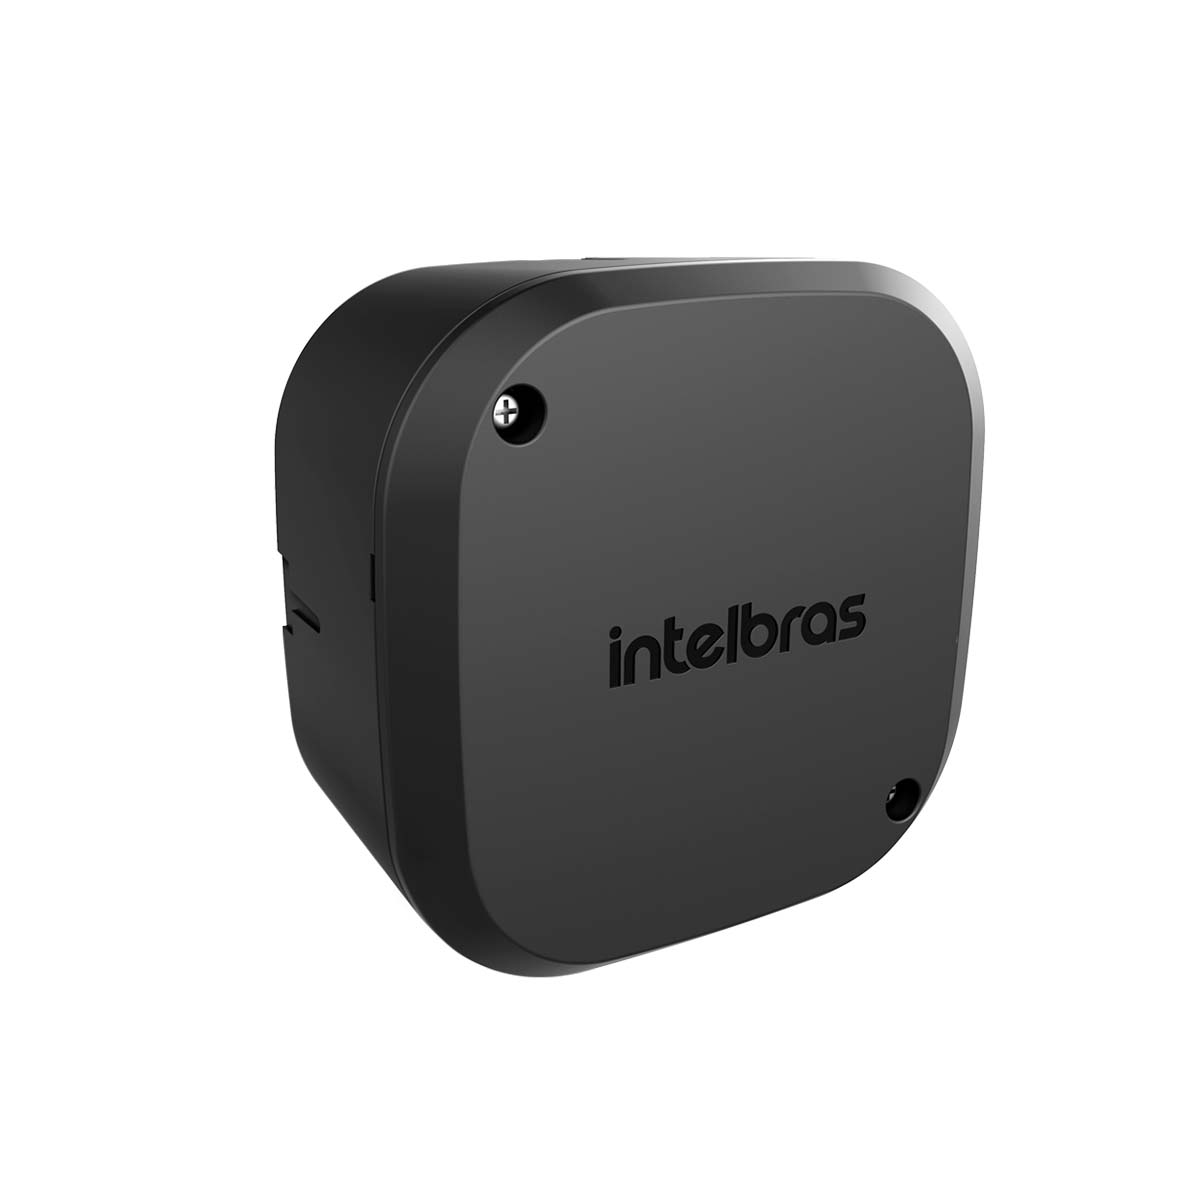 KIT 03 CAIXA PLASTICA DE PASSAGEM INTELBRAS VBOX 1100 BLACK